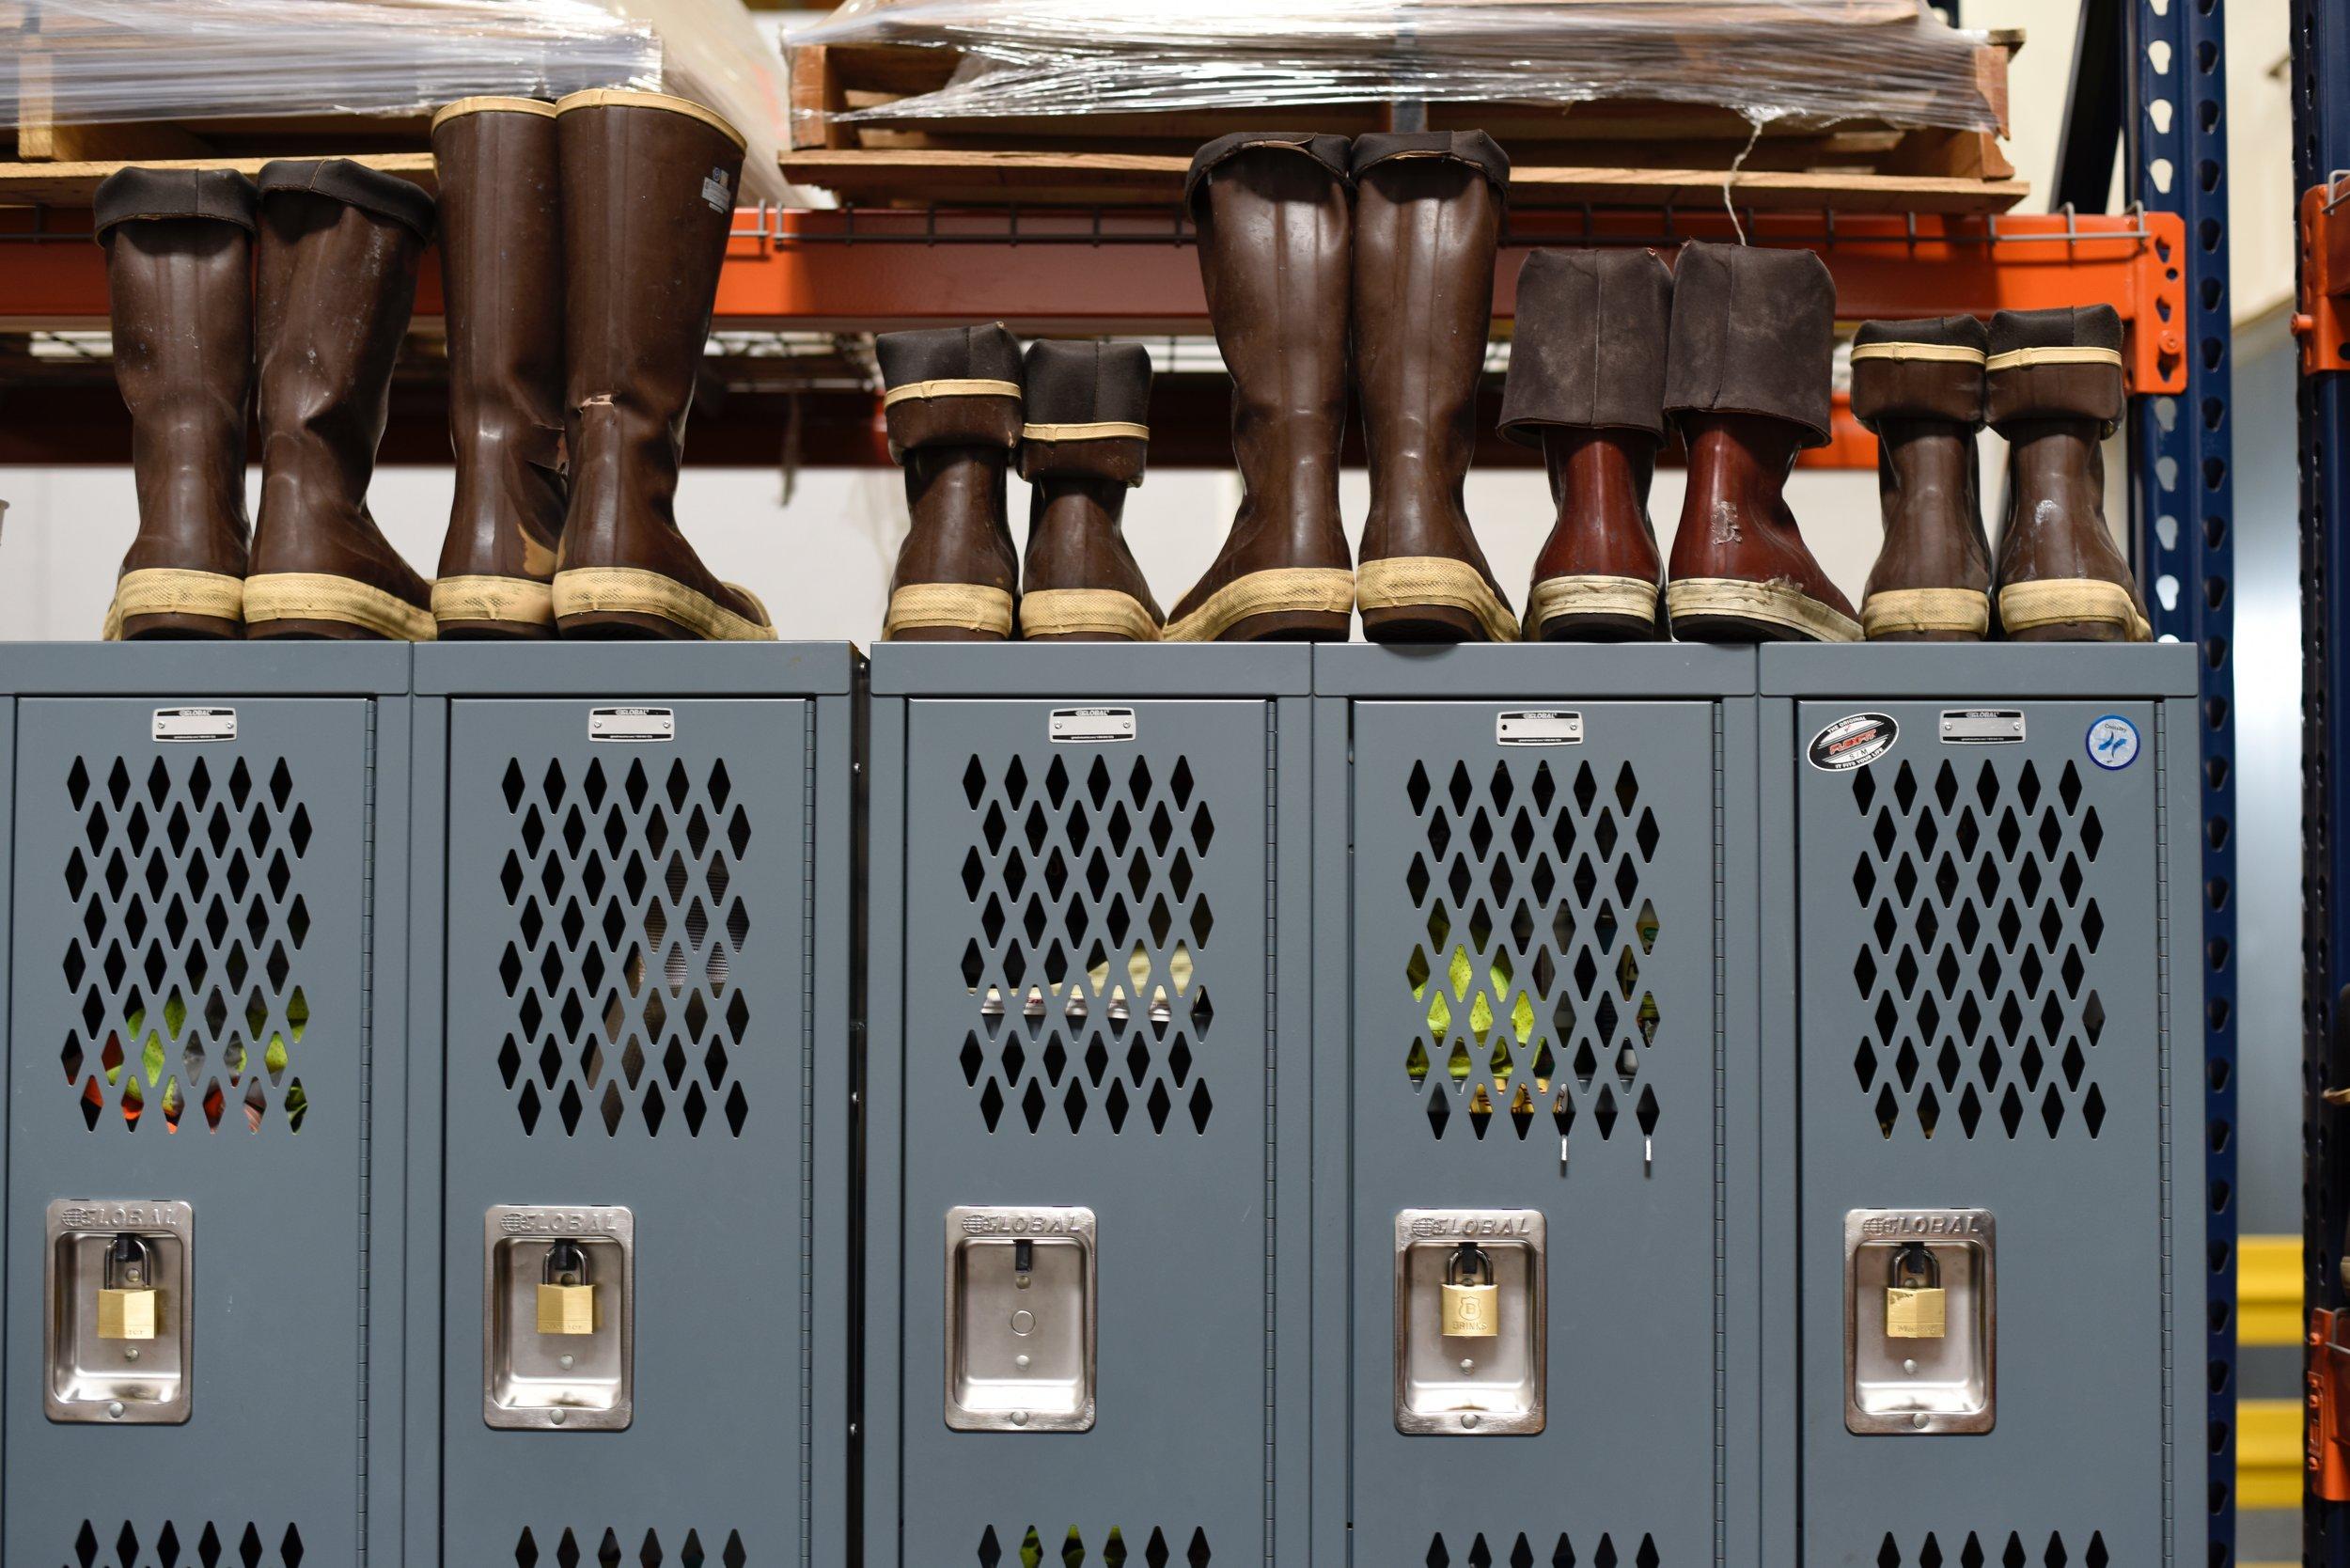 boots-cabinets-data-1267362.jpg